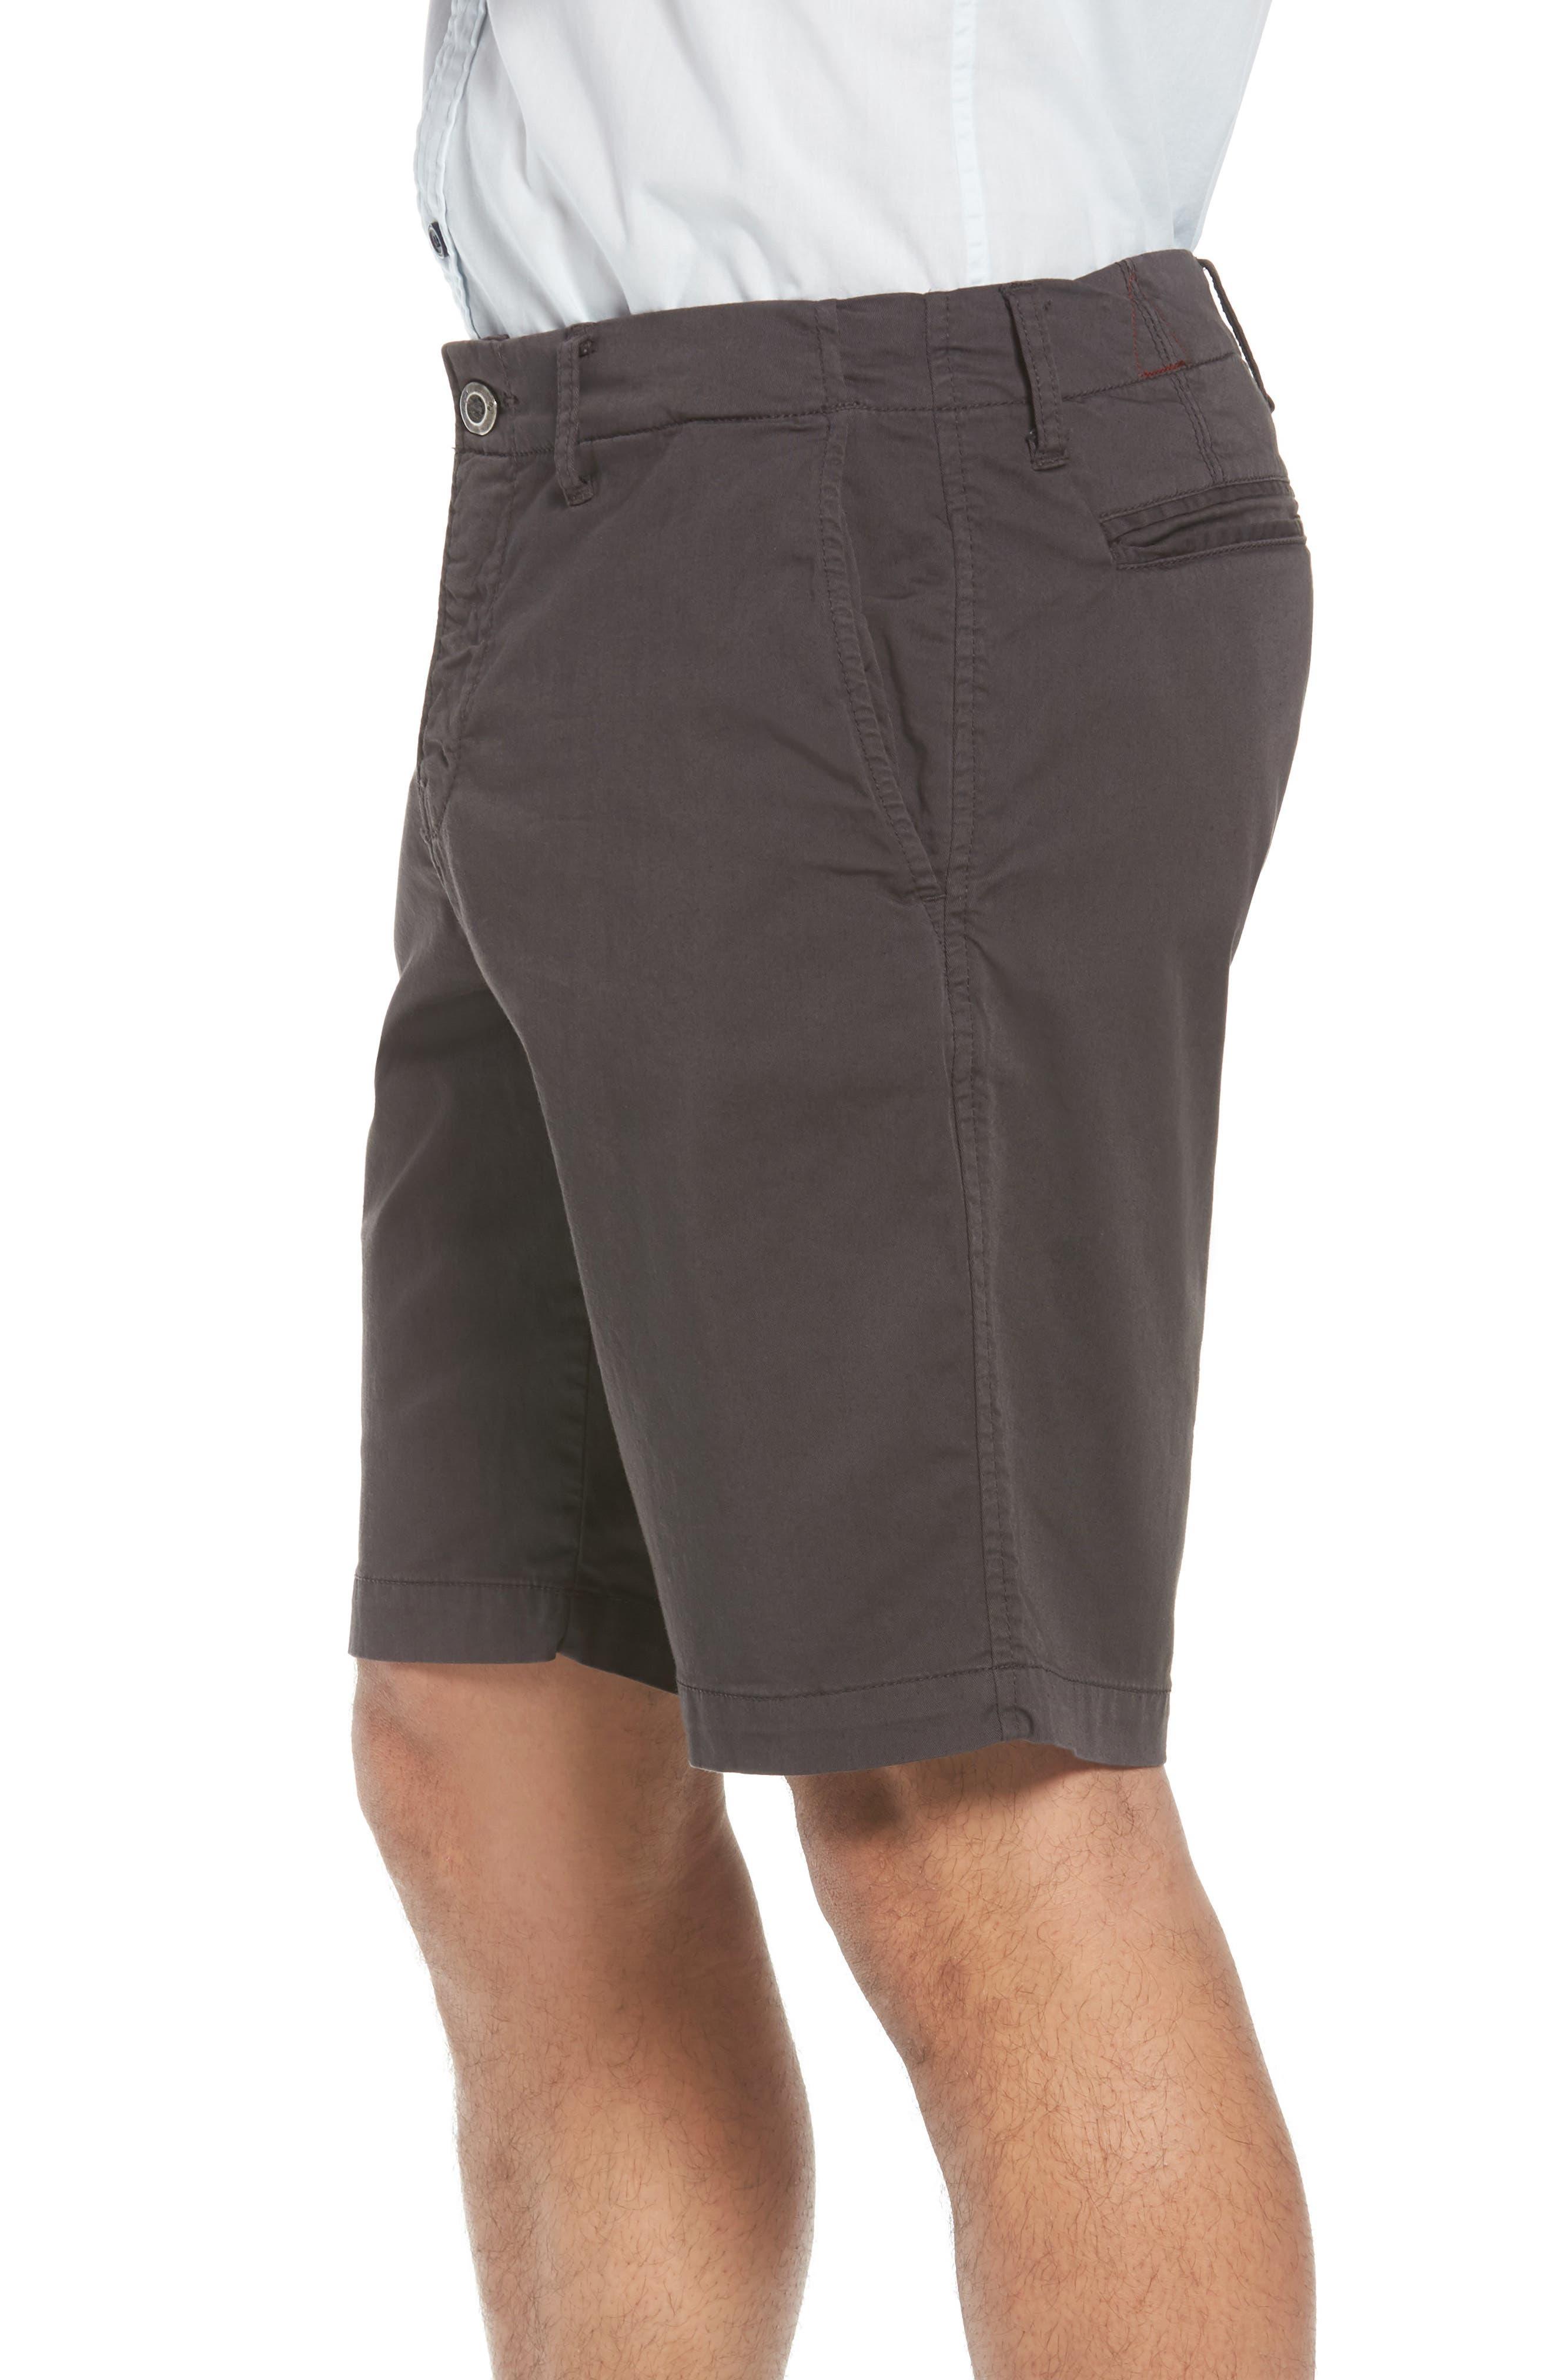 St. Barts Twill Shorts,                             Alternate thumbnail 26, color,